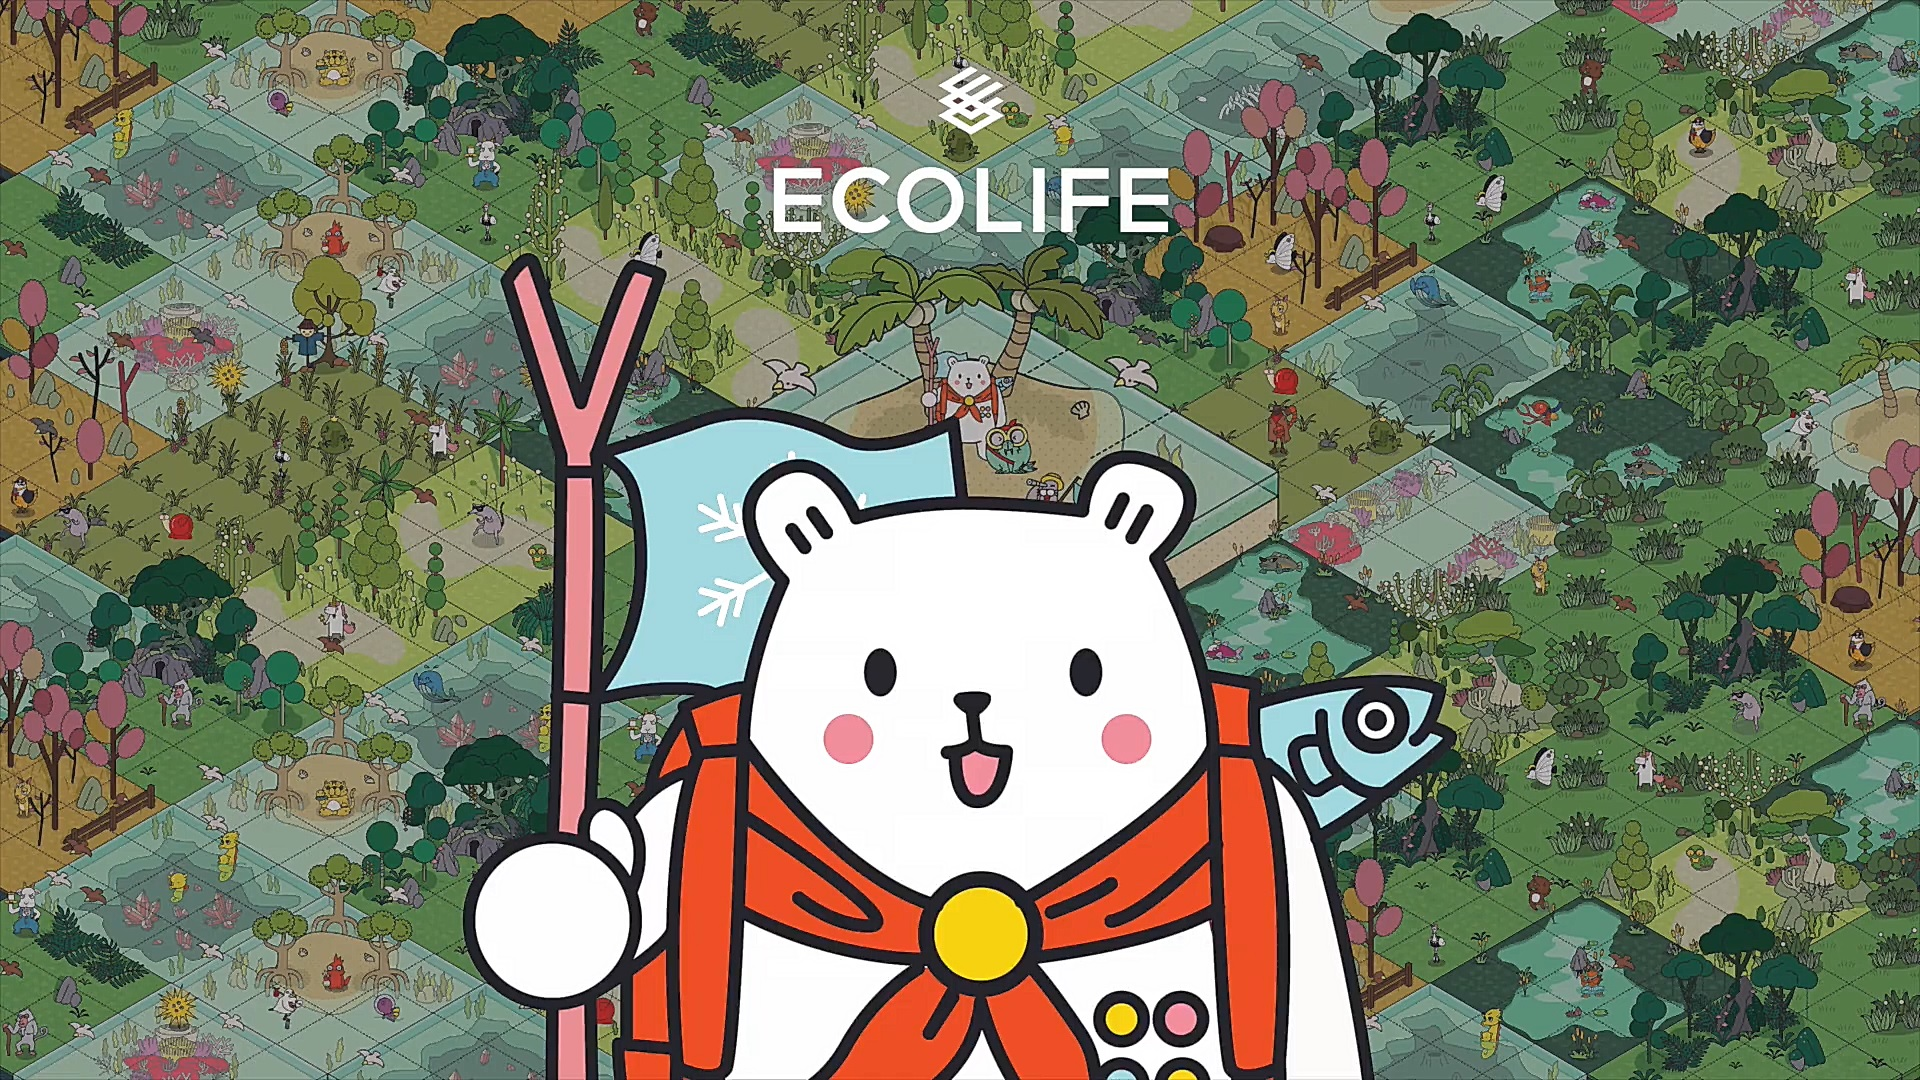 'ECOLIFE' แอพฯ ช่วยโลก ยิ่งเล่น..ยิ่งลดขยะพลาสติก